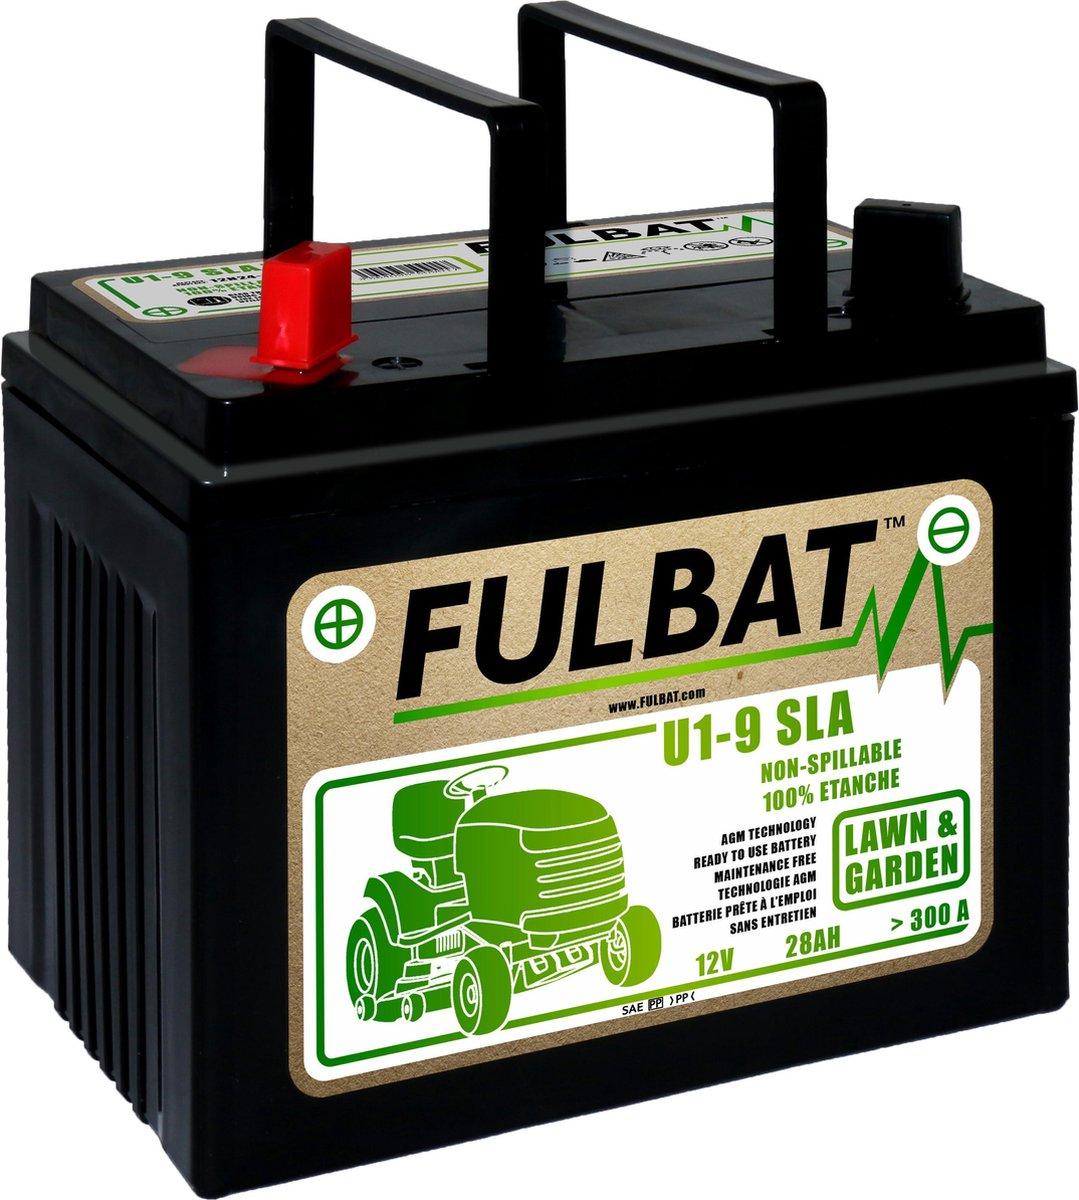 Fulbat/BoParts Accu 12V/28Ah - 12N24-4 / U19